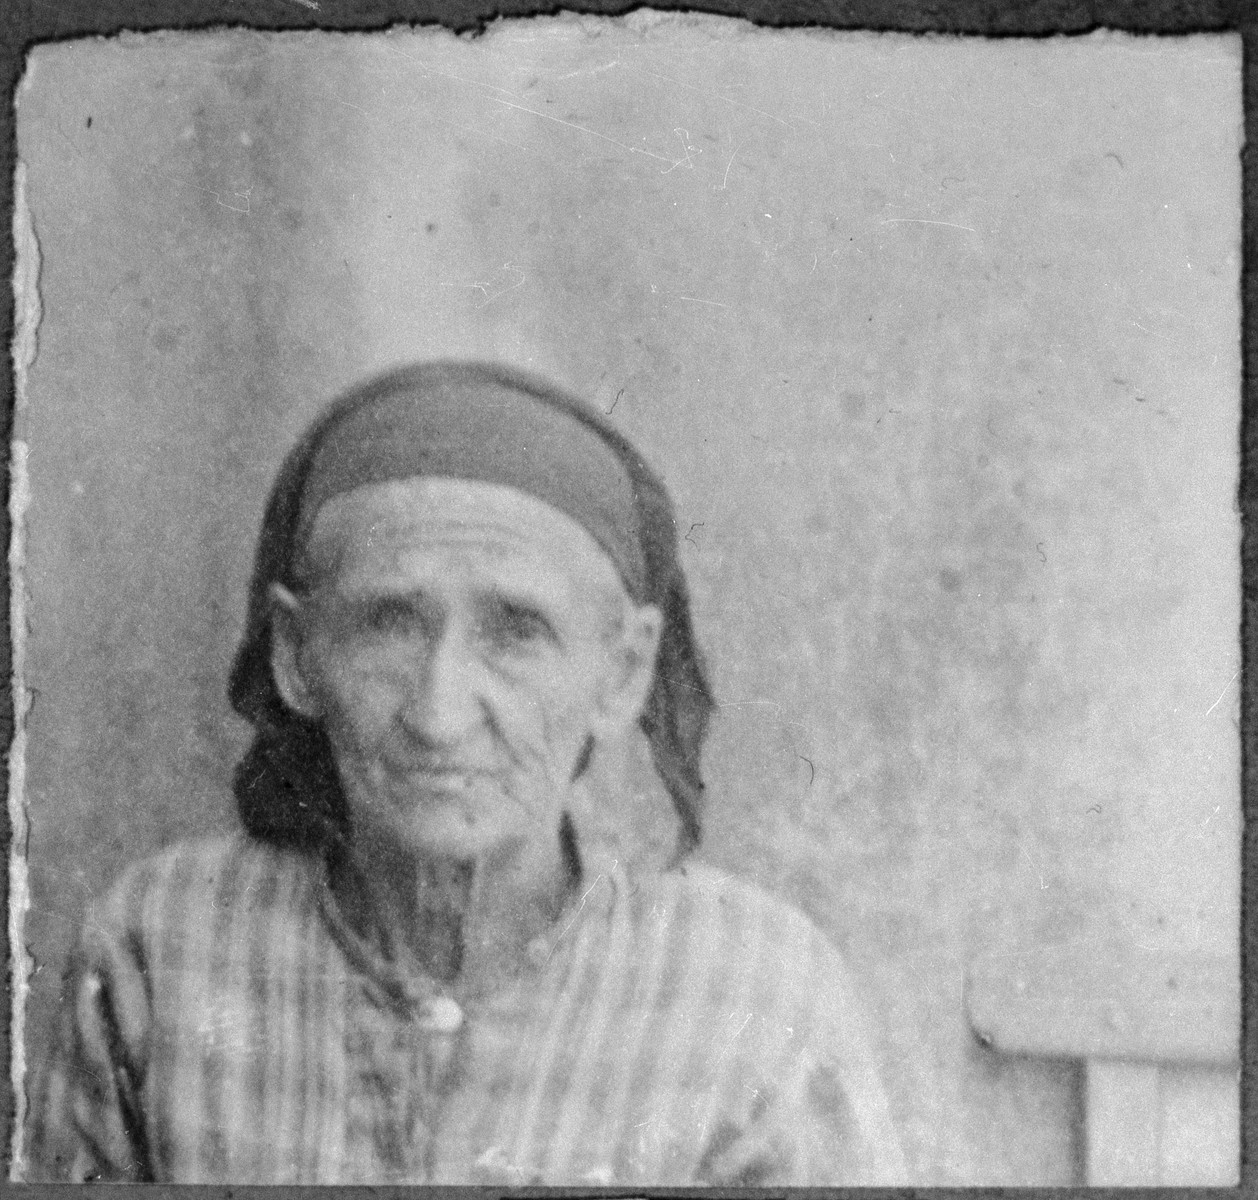 Portrait of Bohora Pesso. She lived at Drinska 119 in Bitola.